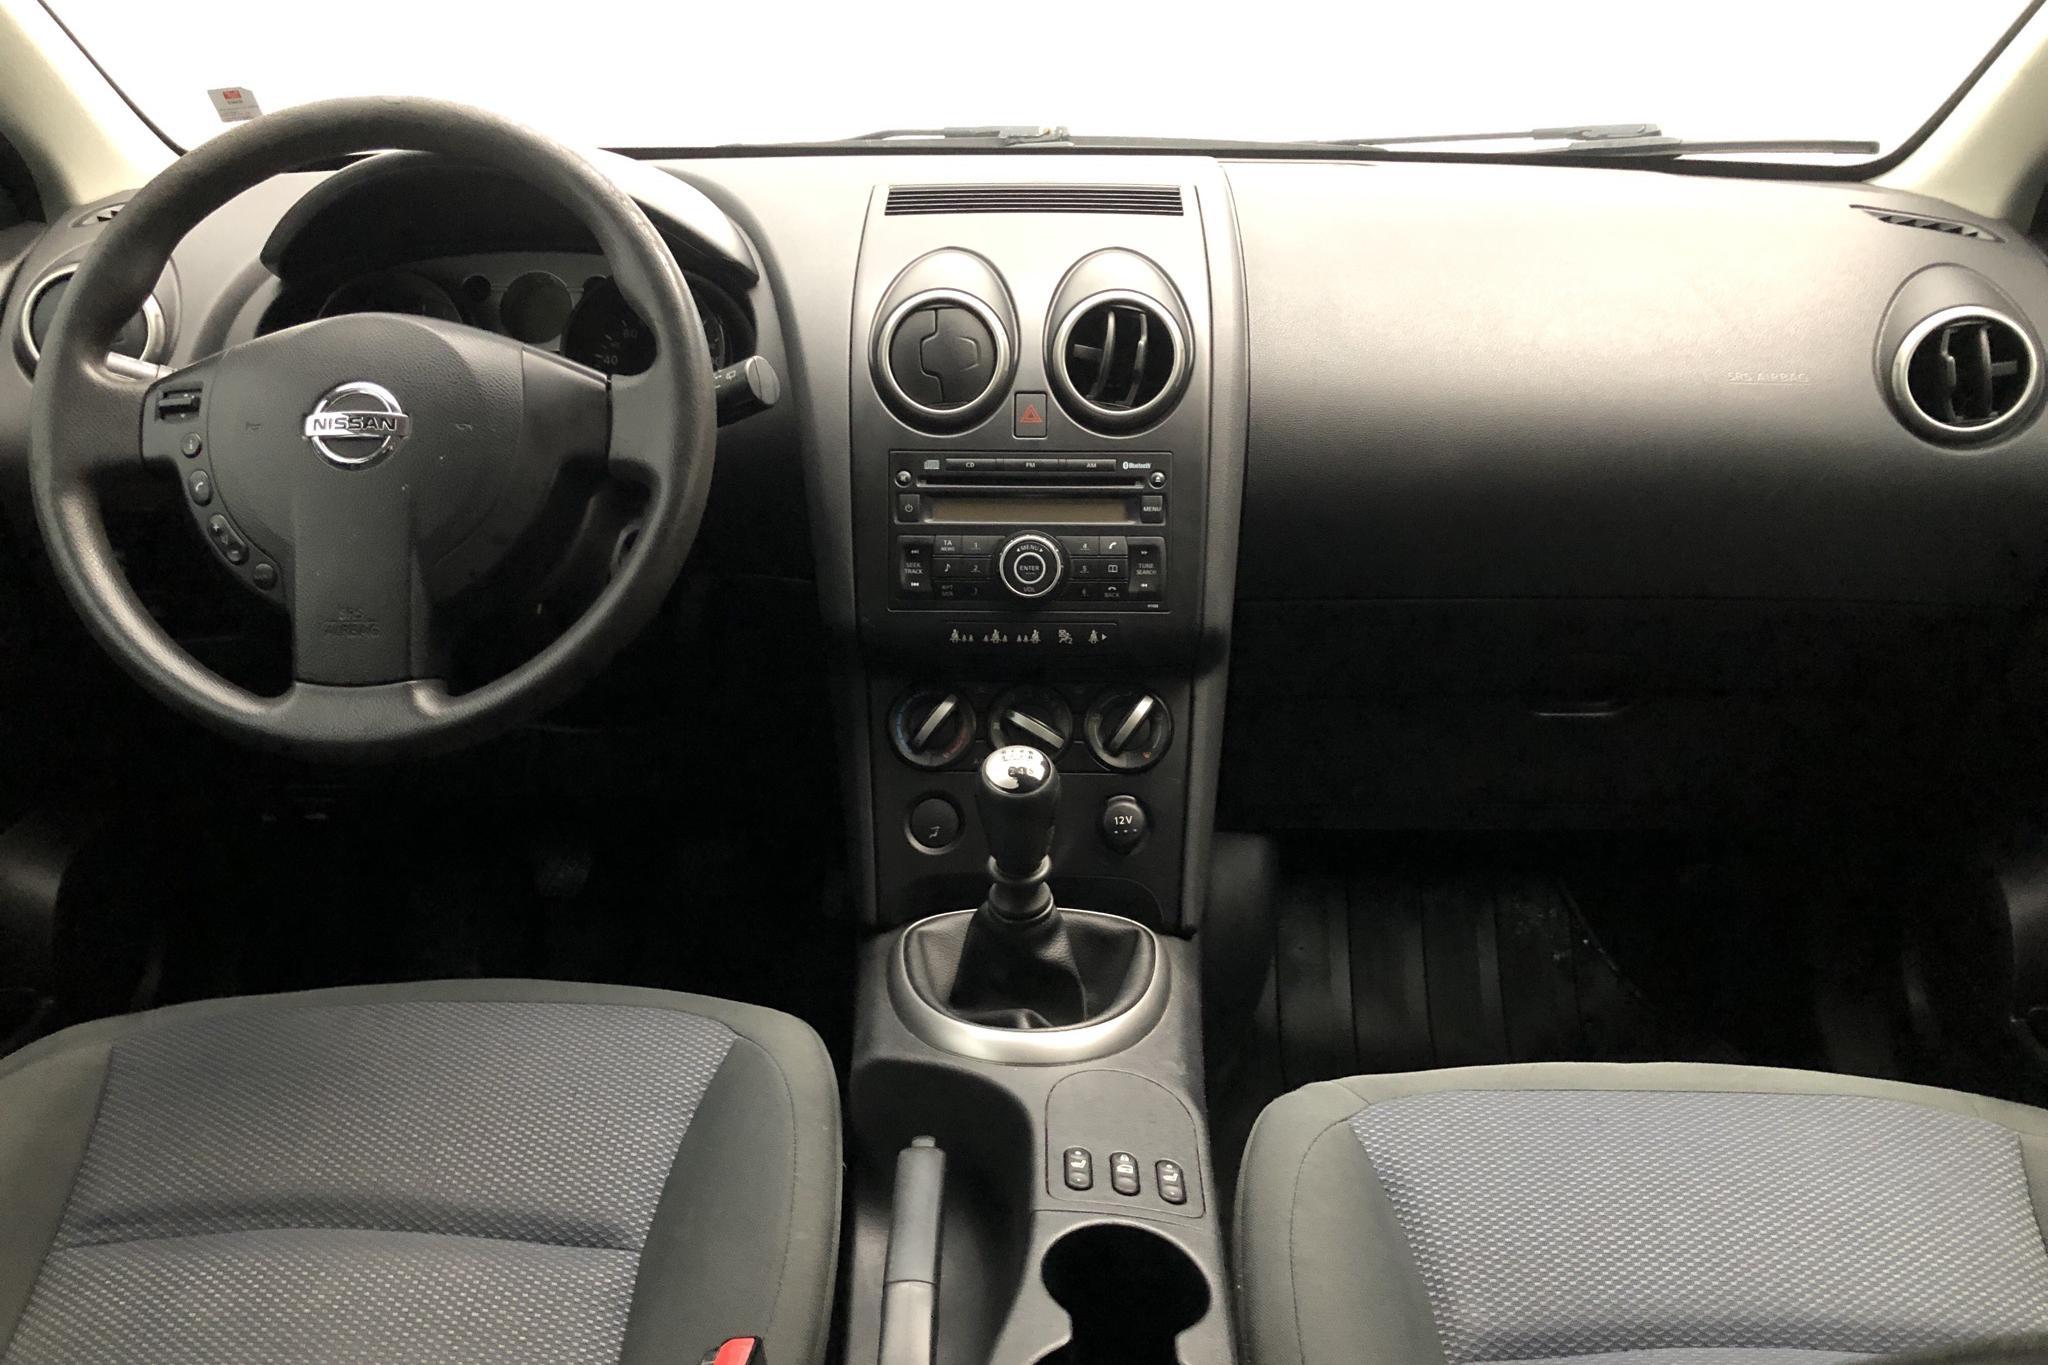 Nissan Qashqai 2.0 dCi (150hk) - 229 640 km - Manual - blue - 2008